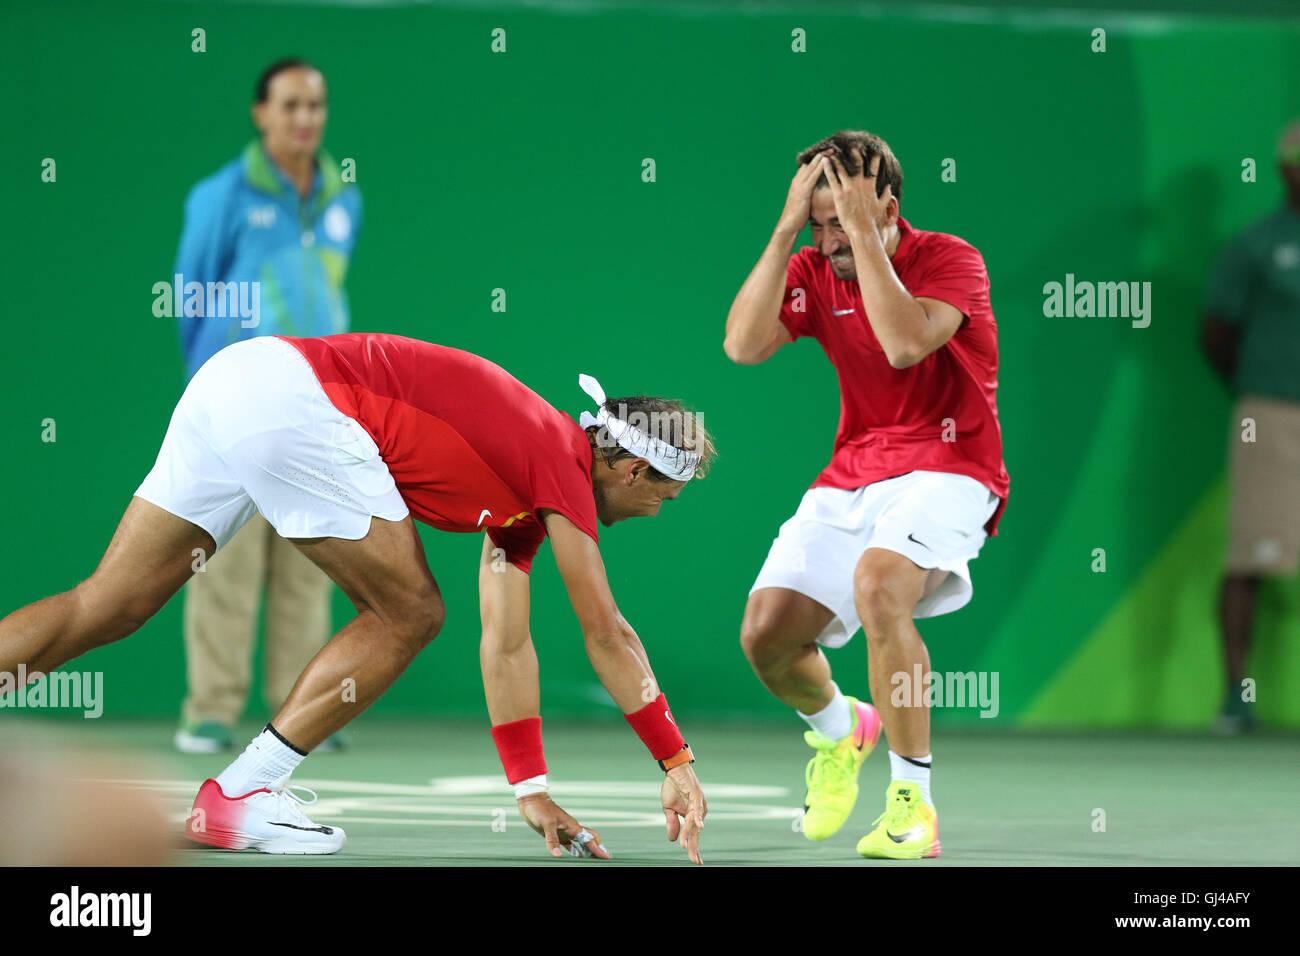 Rio De Janeiro, Rio de Janeiro, Brazil. 12th Aug, 2016. RJ - Olympic/Tennis Games - SPORTS - Rafael Nadal and Marc - Stock Image